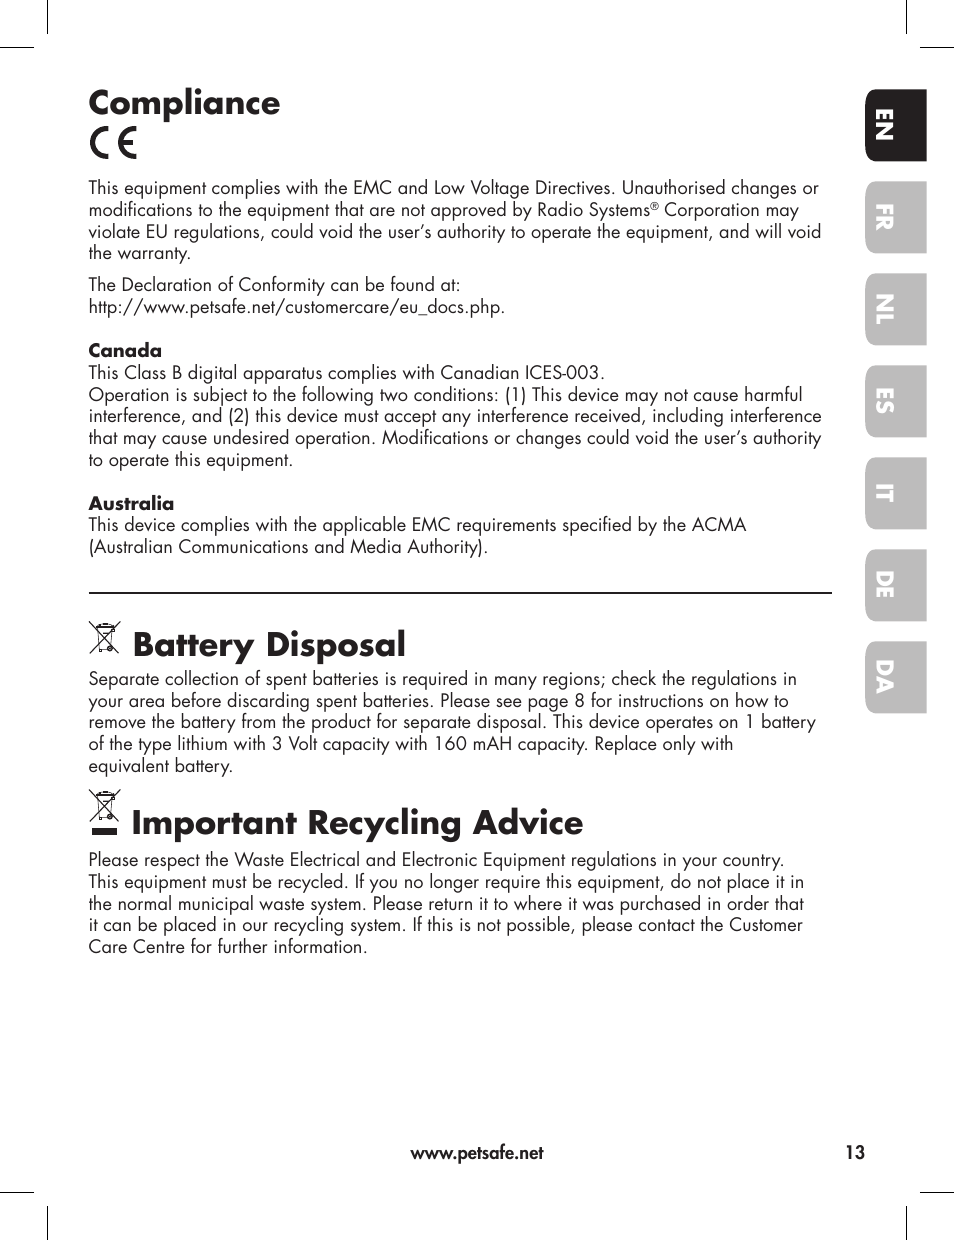 Compliance, Battery disposal, Important recycling advice | Petsafe